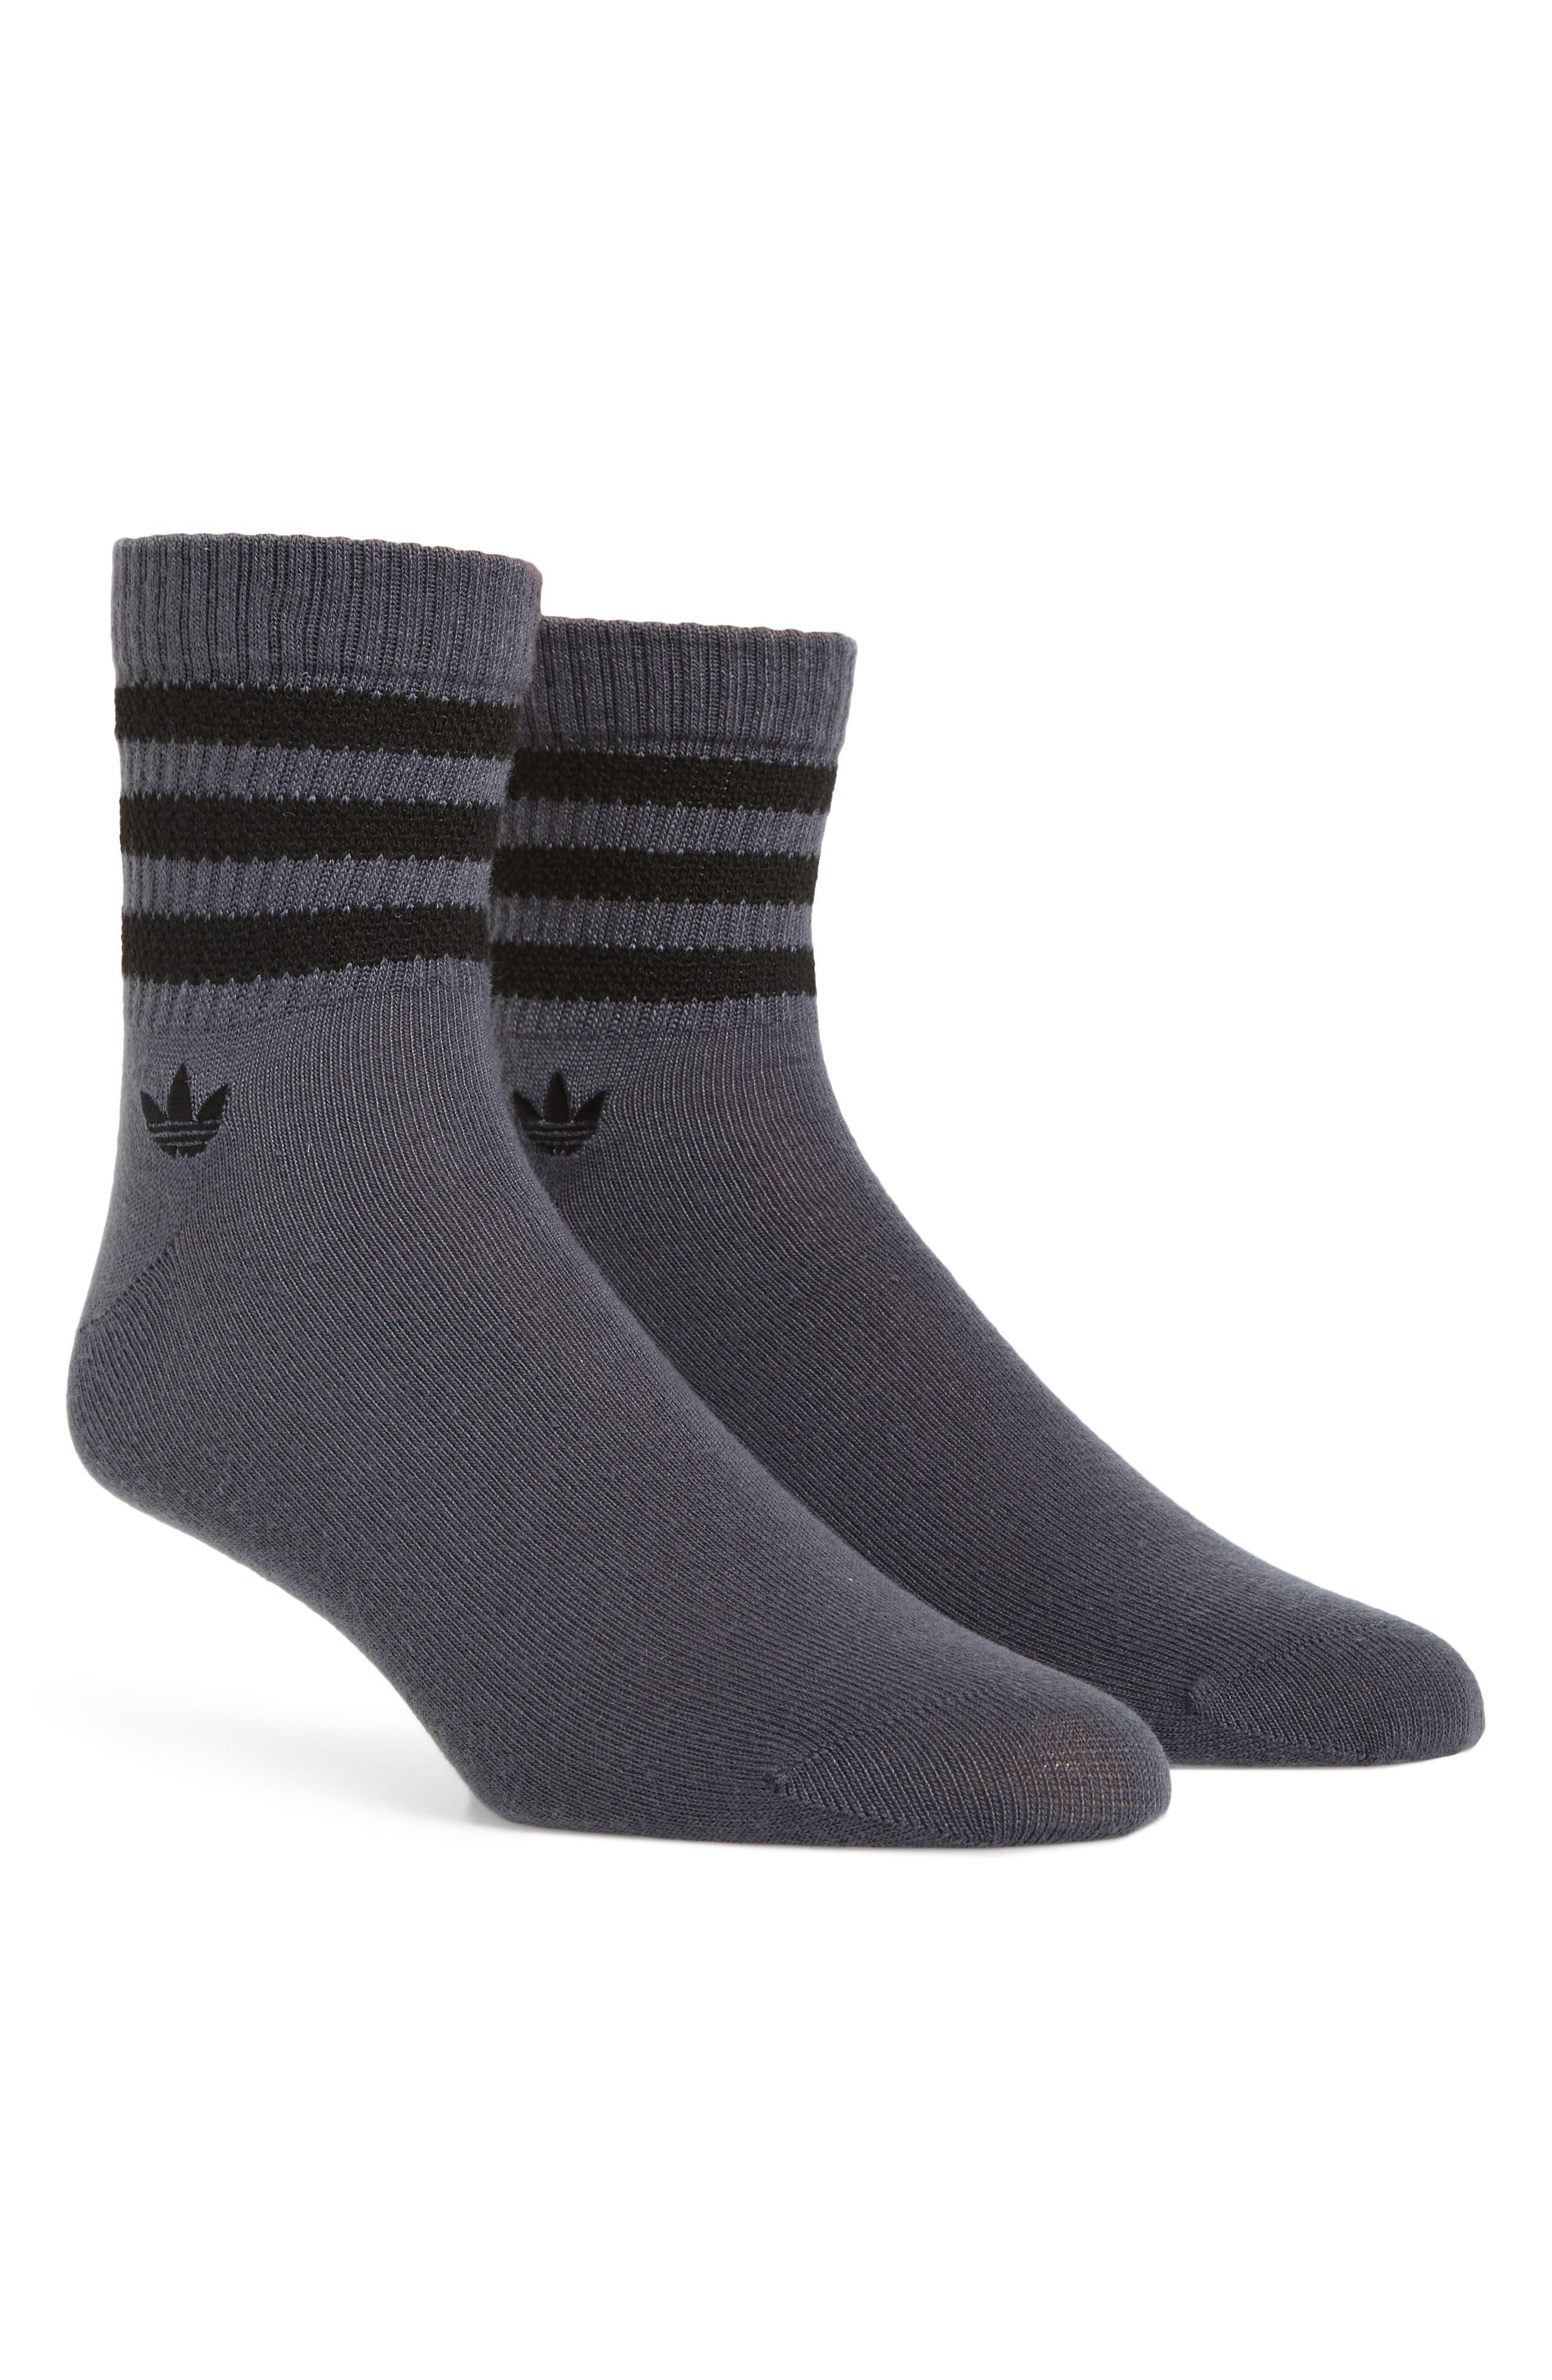 Textured 3-Stripes Crew Socks,                             Main thumbnail 1, color,                             020